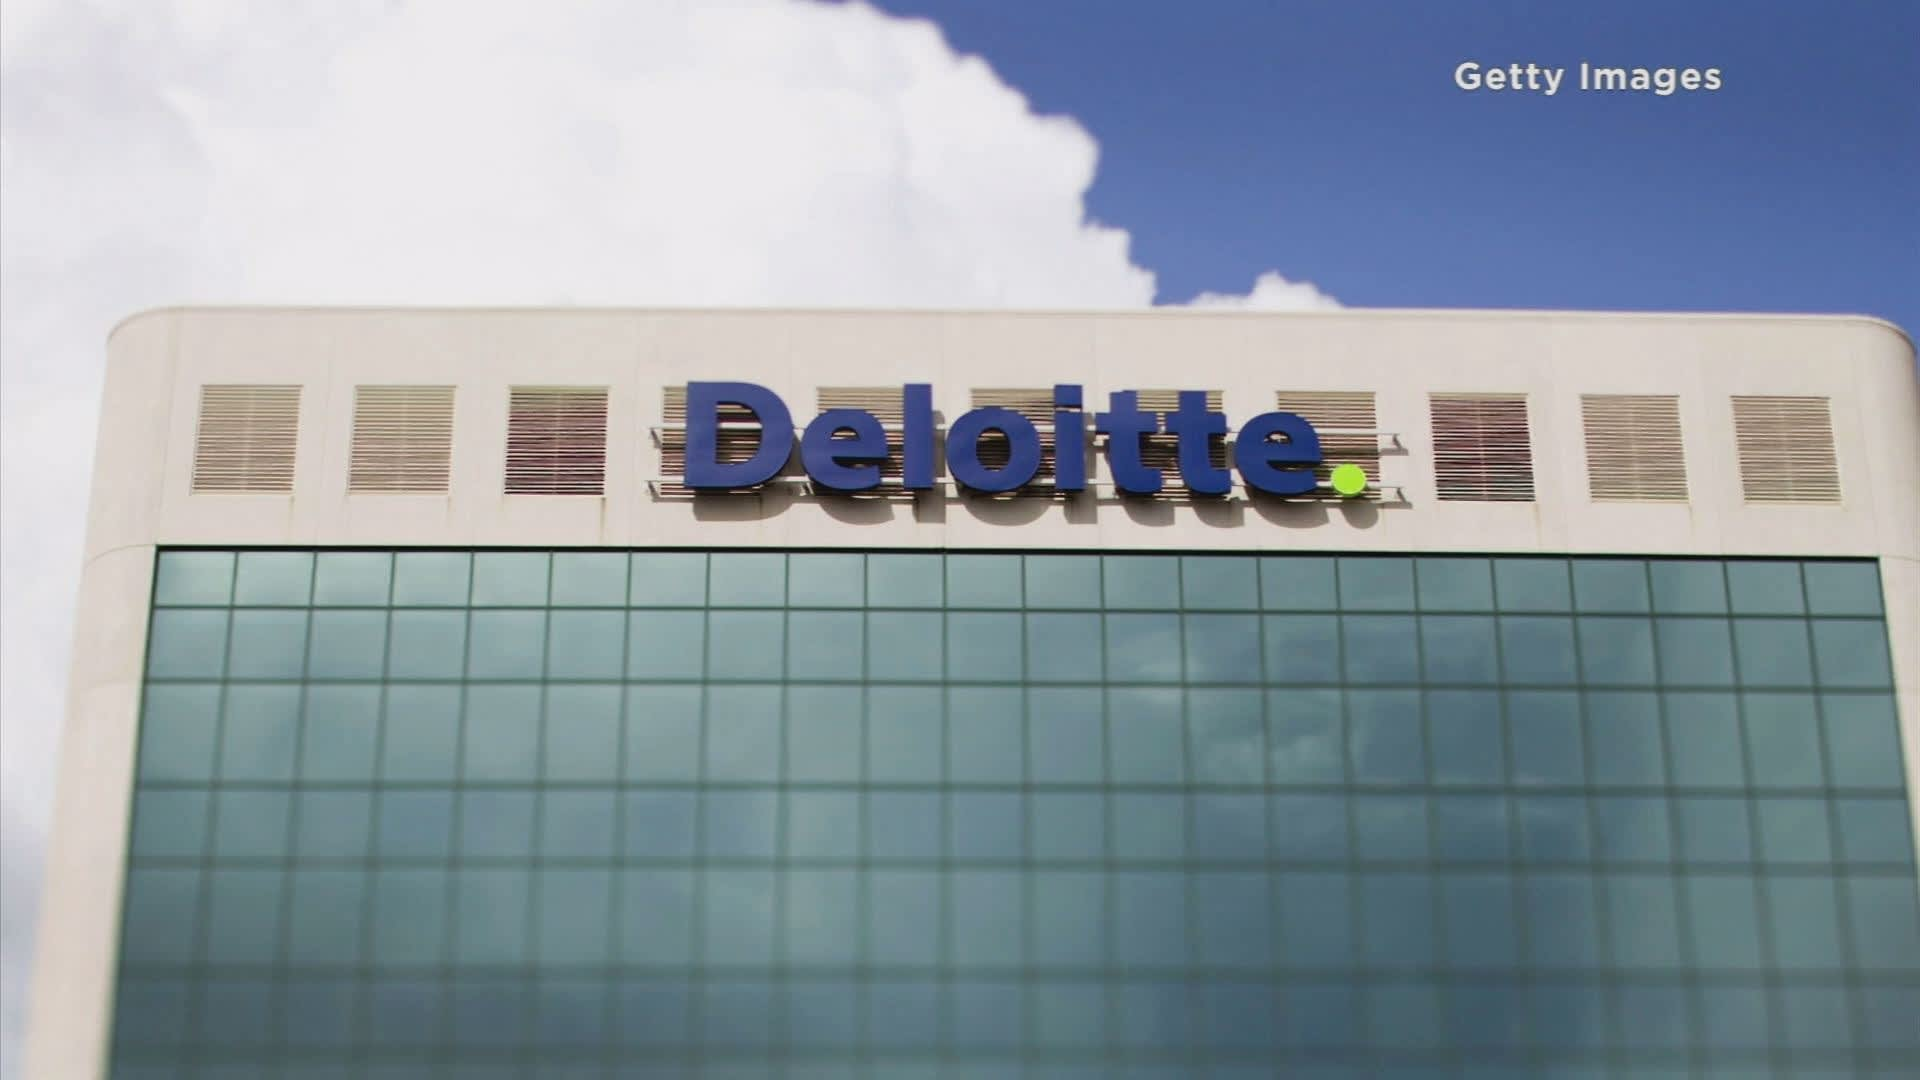 Deloitte's secret history of espionage practice